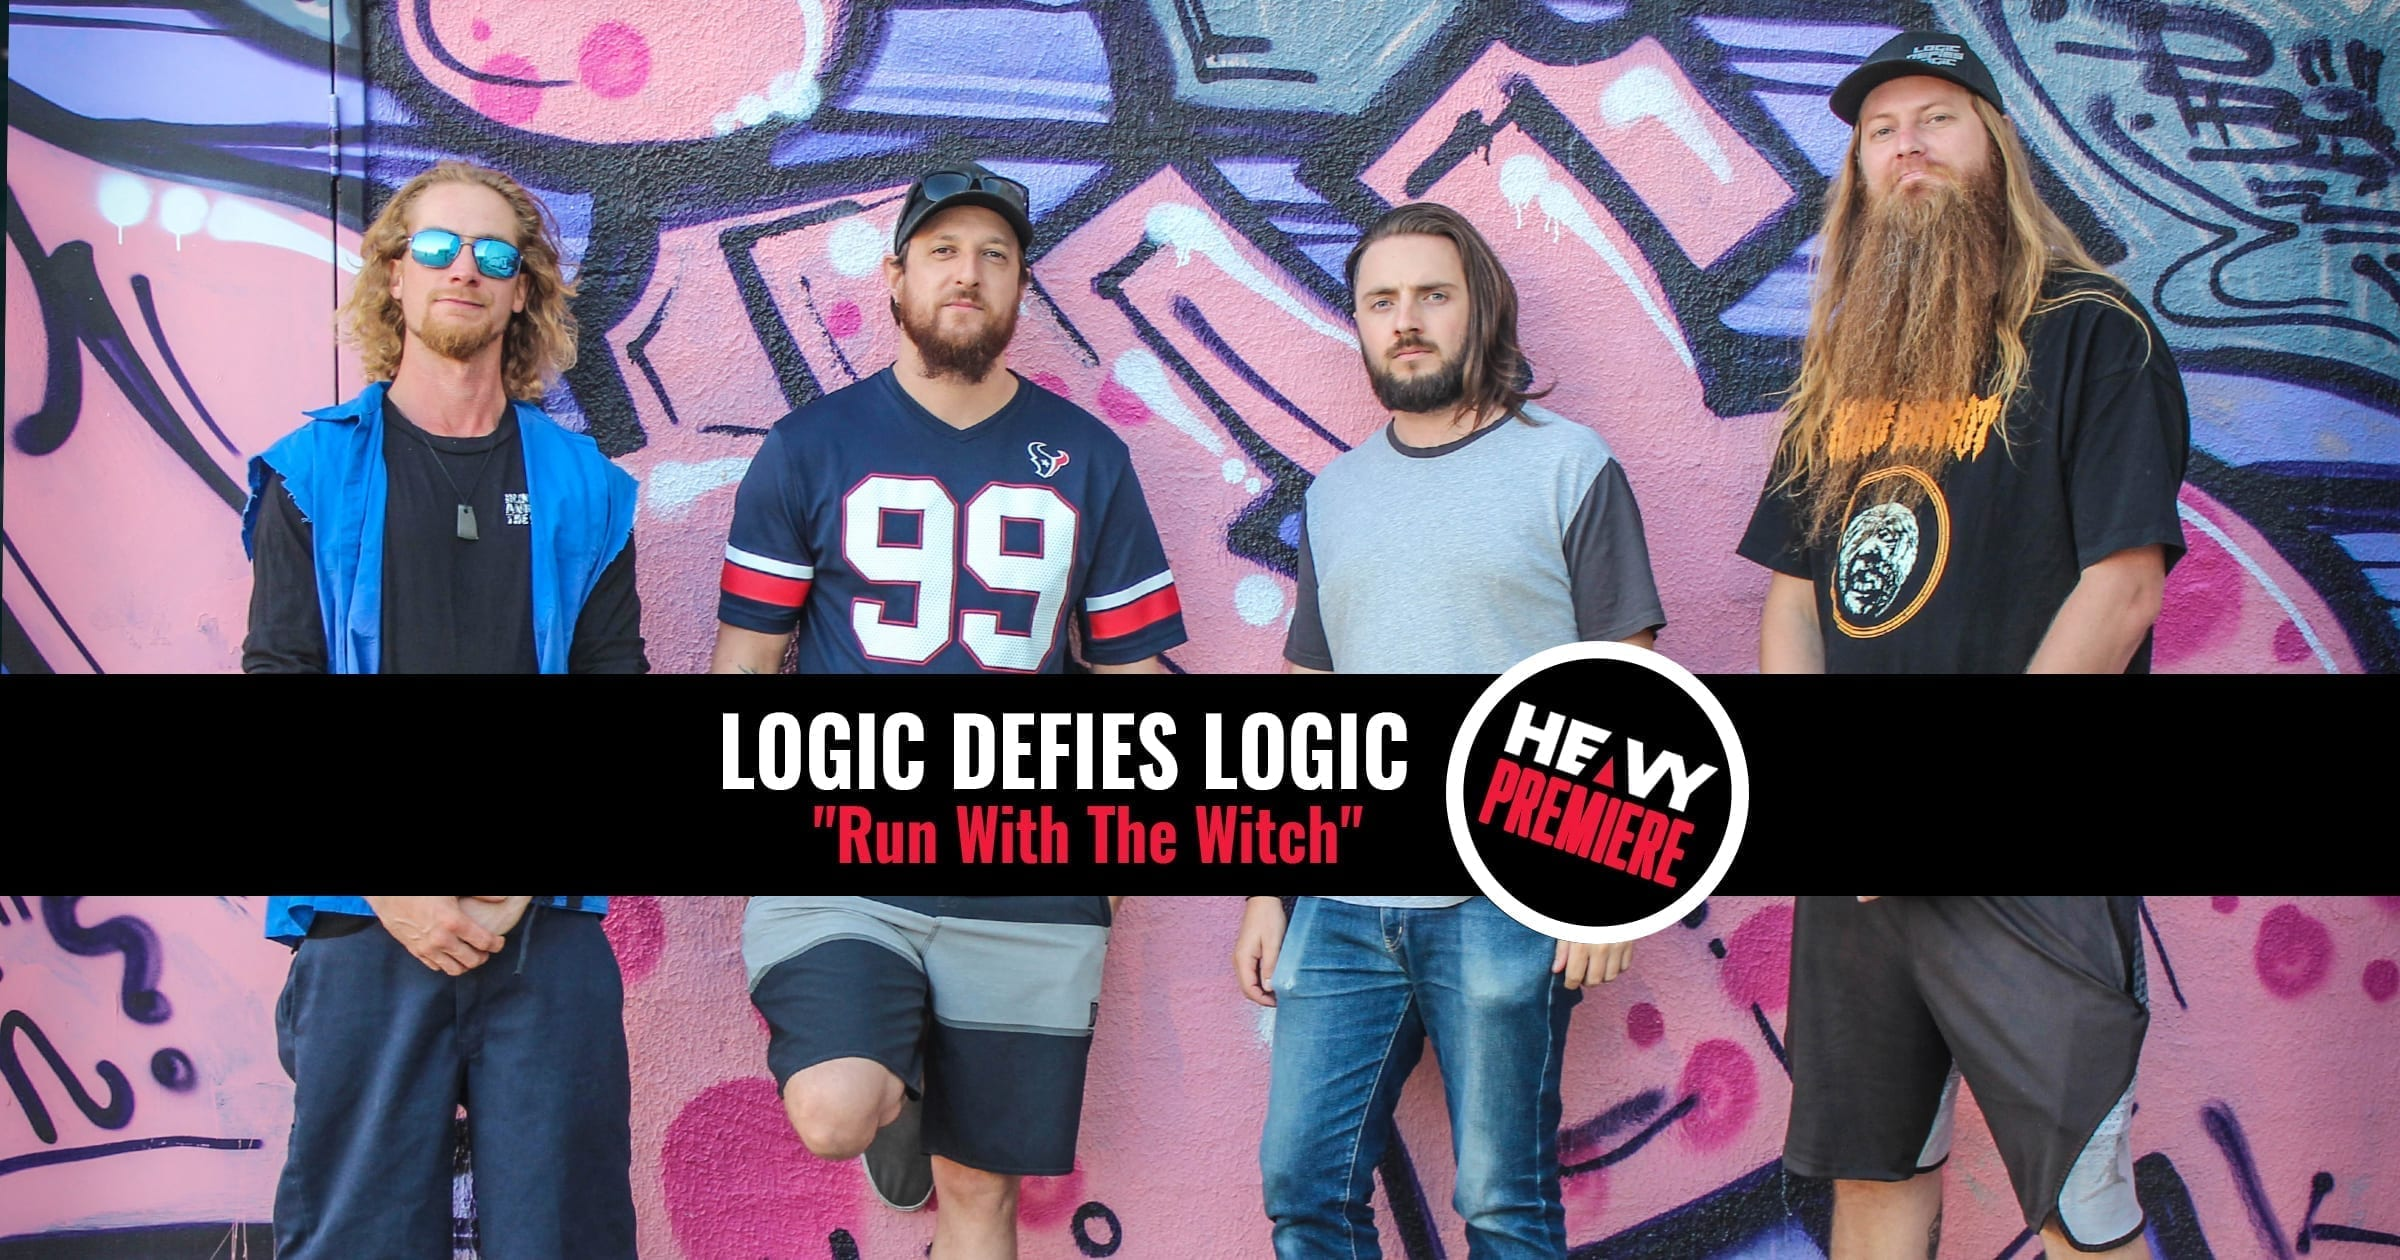 Logic Defies Logic - Premiere - HEAVY Magazine